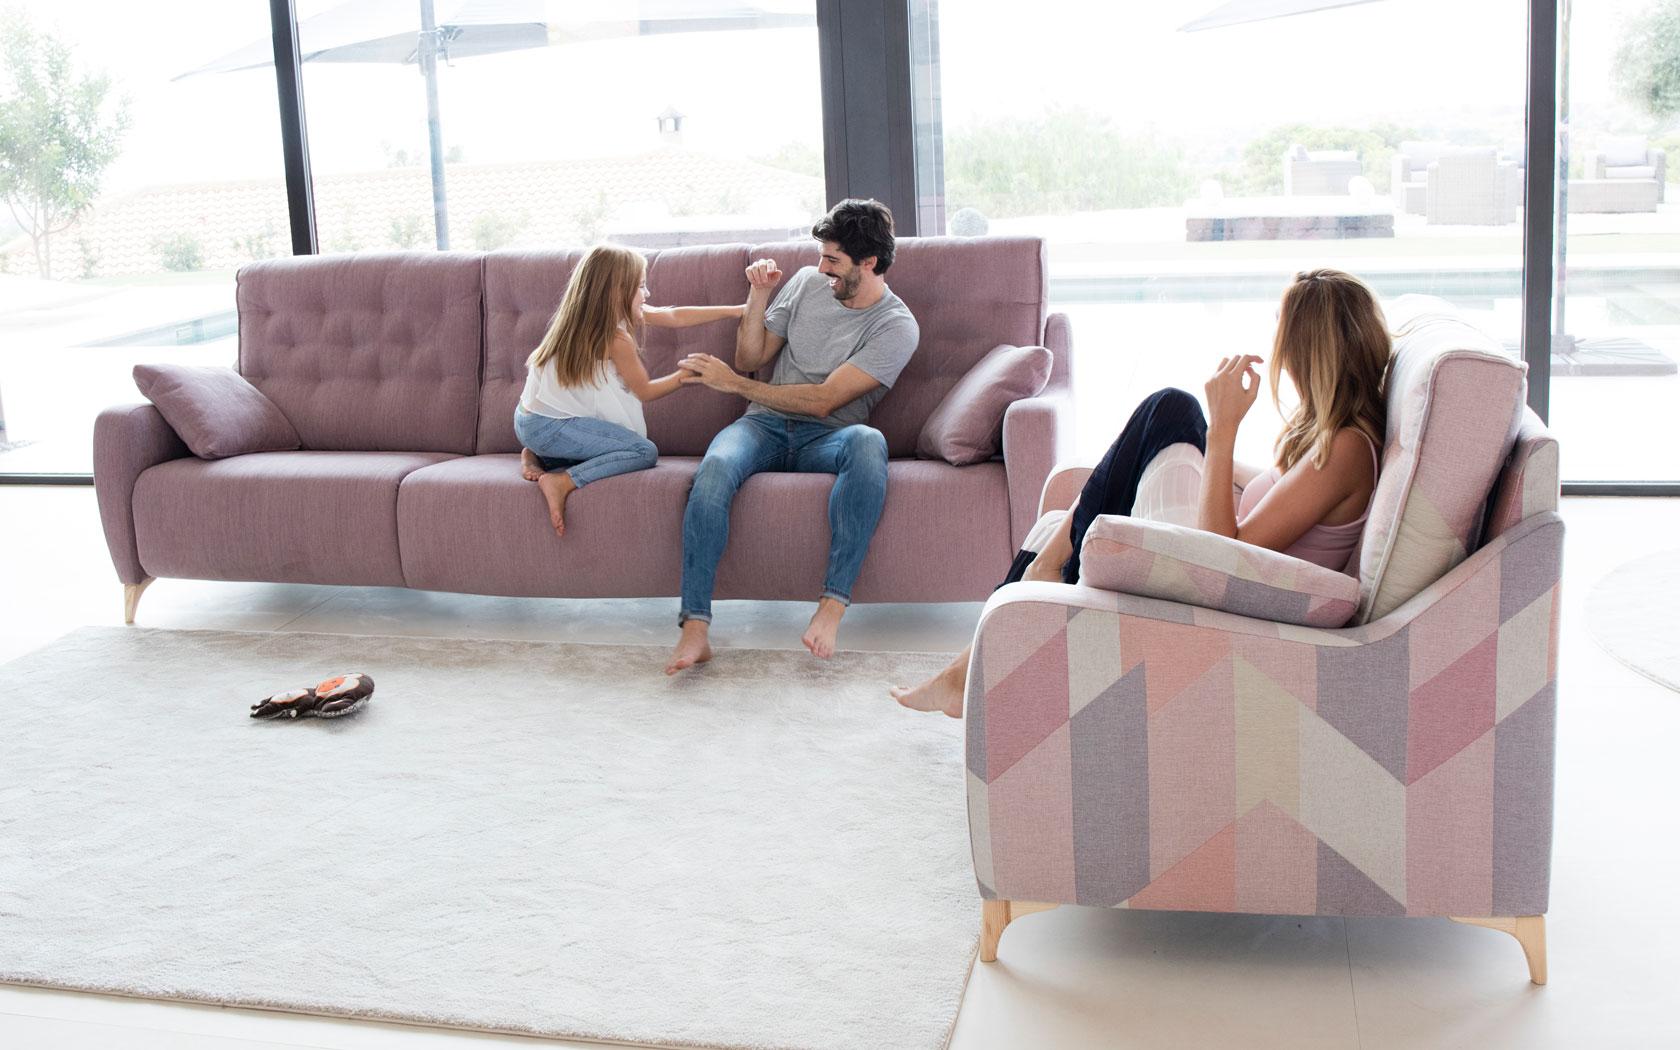 Avalon sofa relax 2019 07